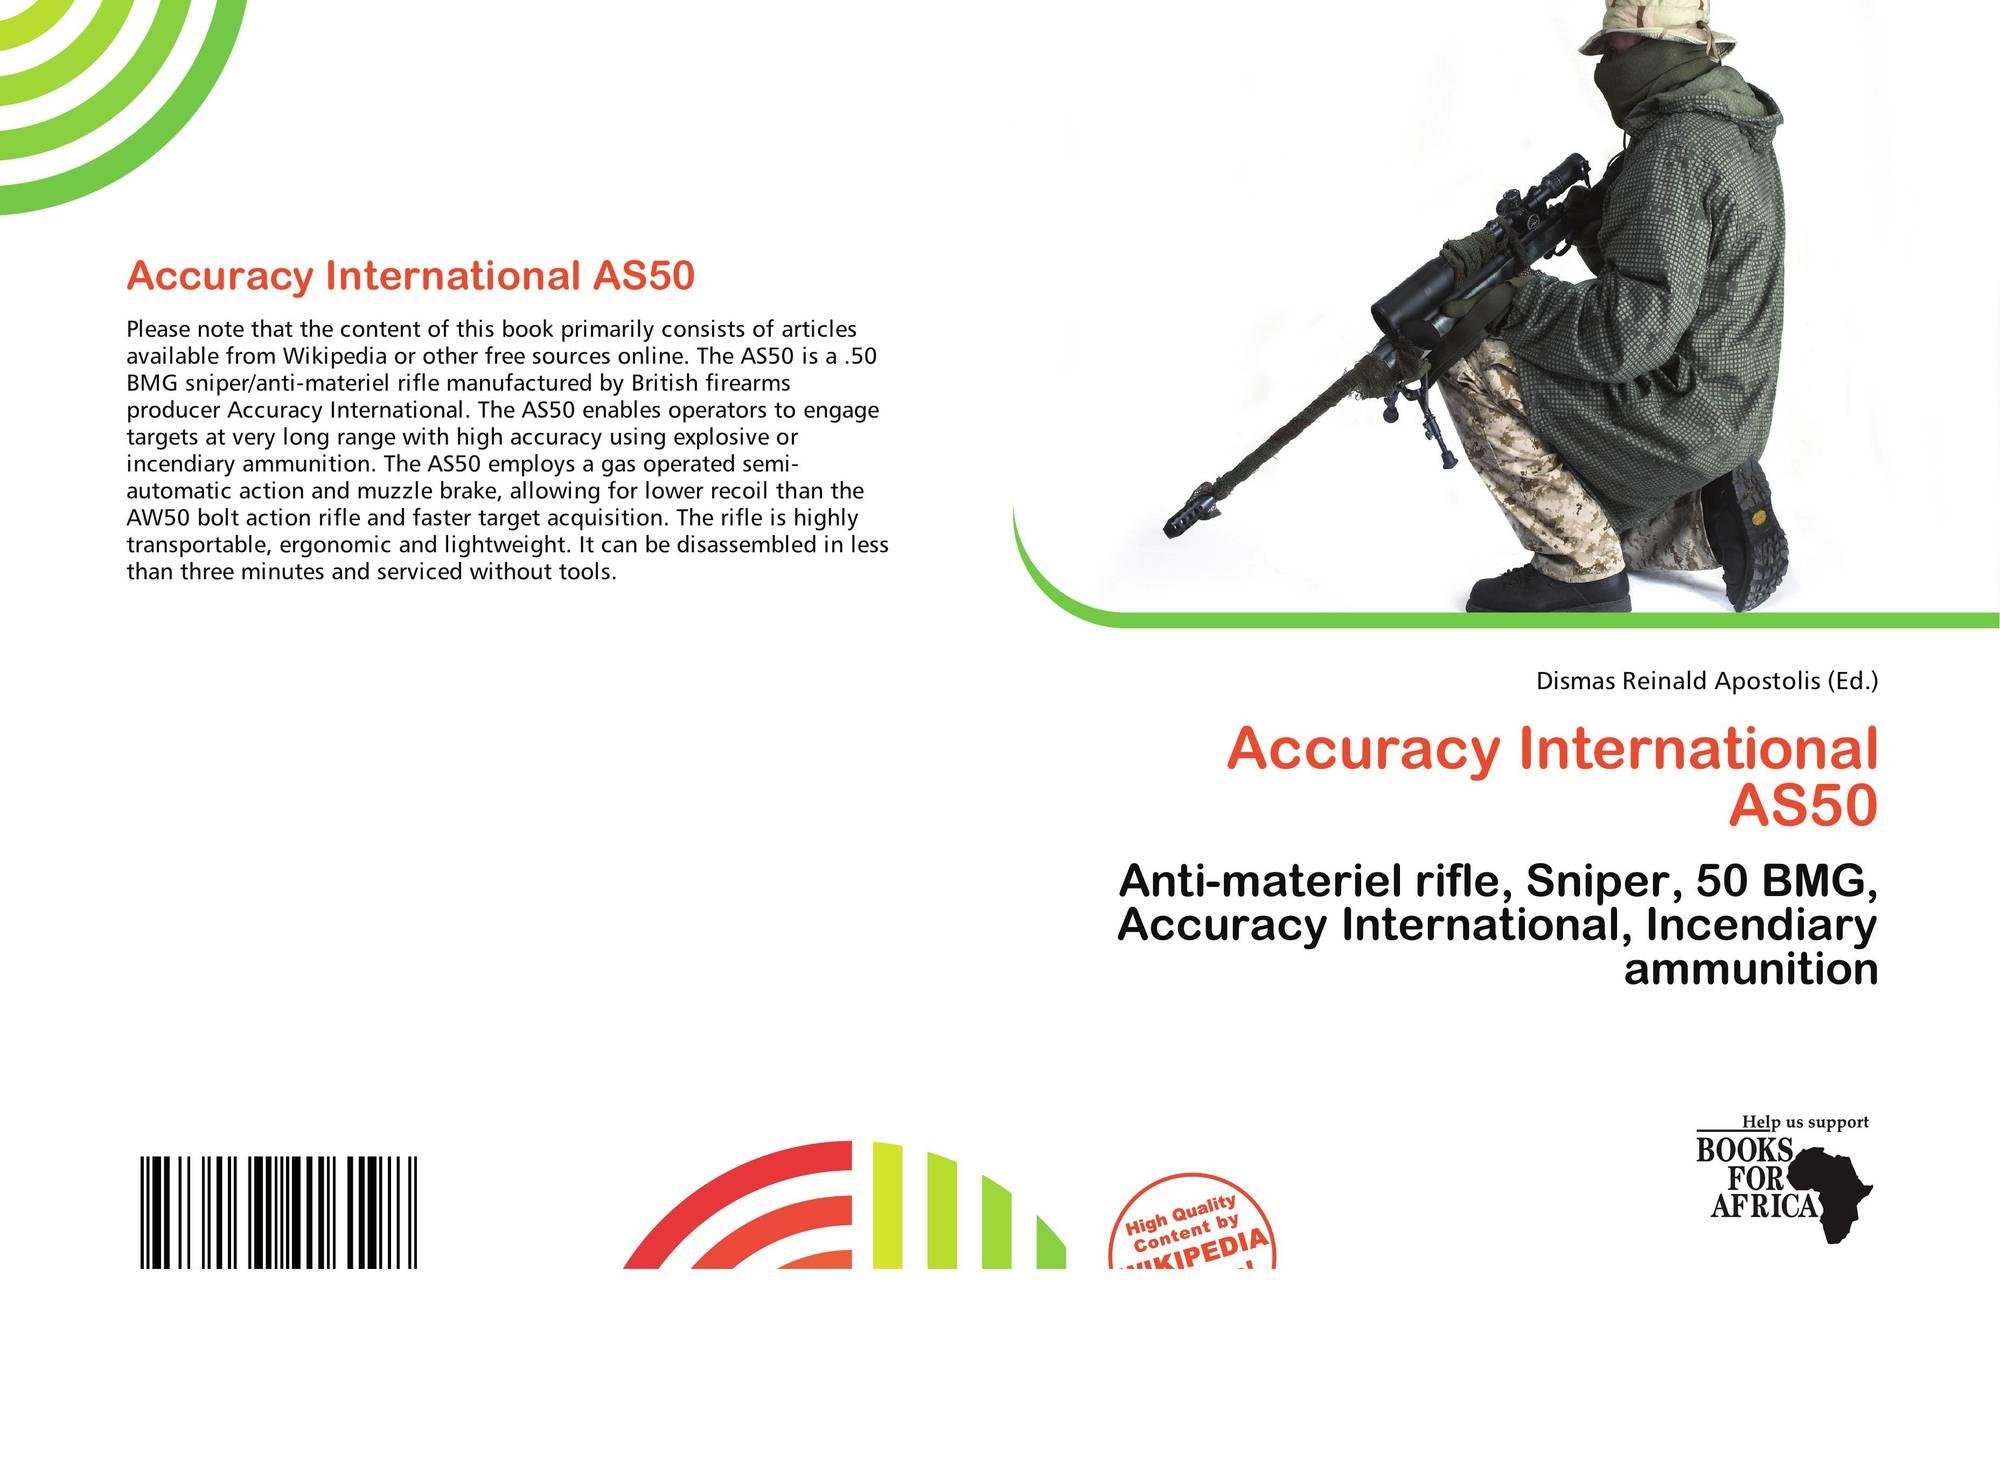 Accuracy International AS50, 978-613-7-41619-8, 6137416194